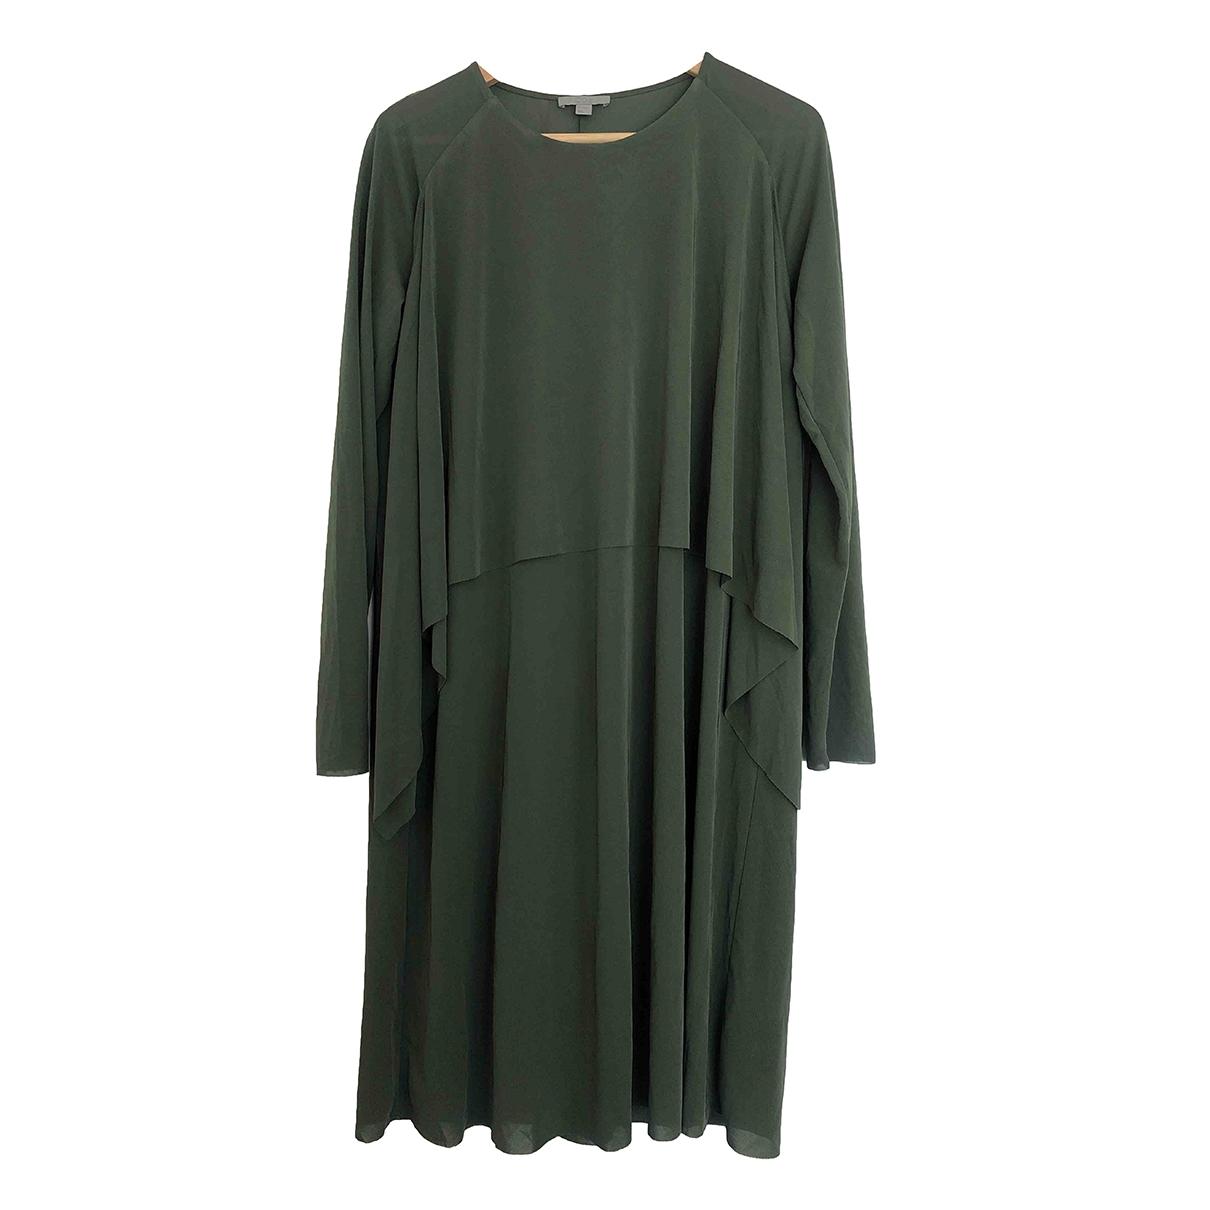 Cos \N Green dress for Women M International